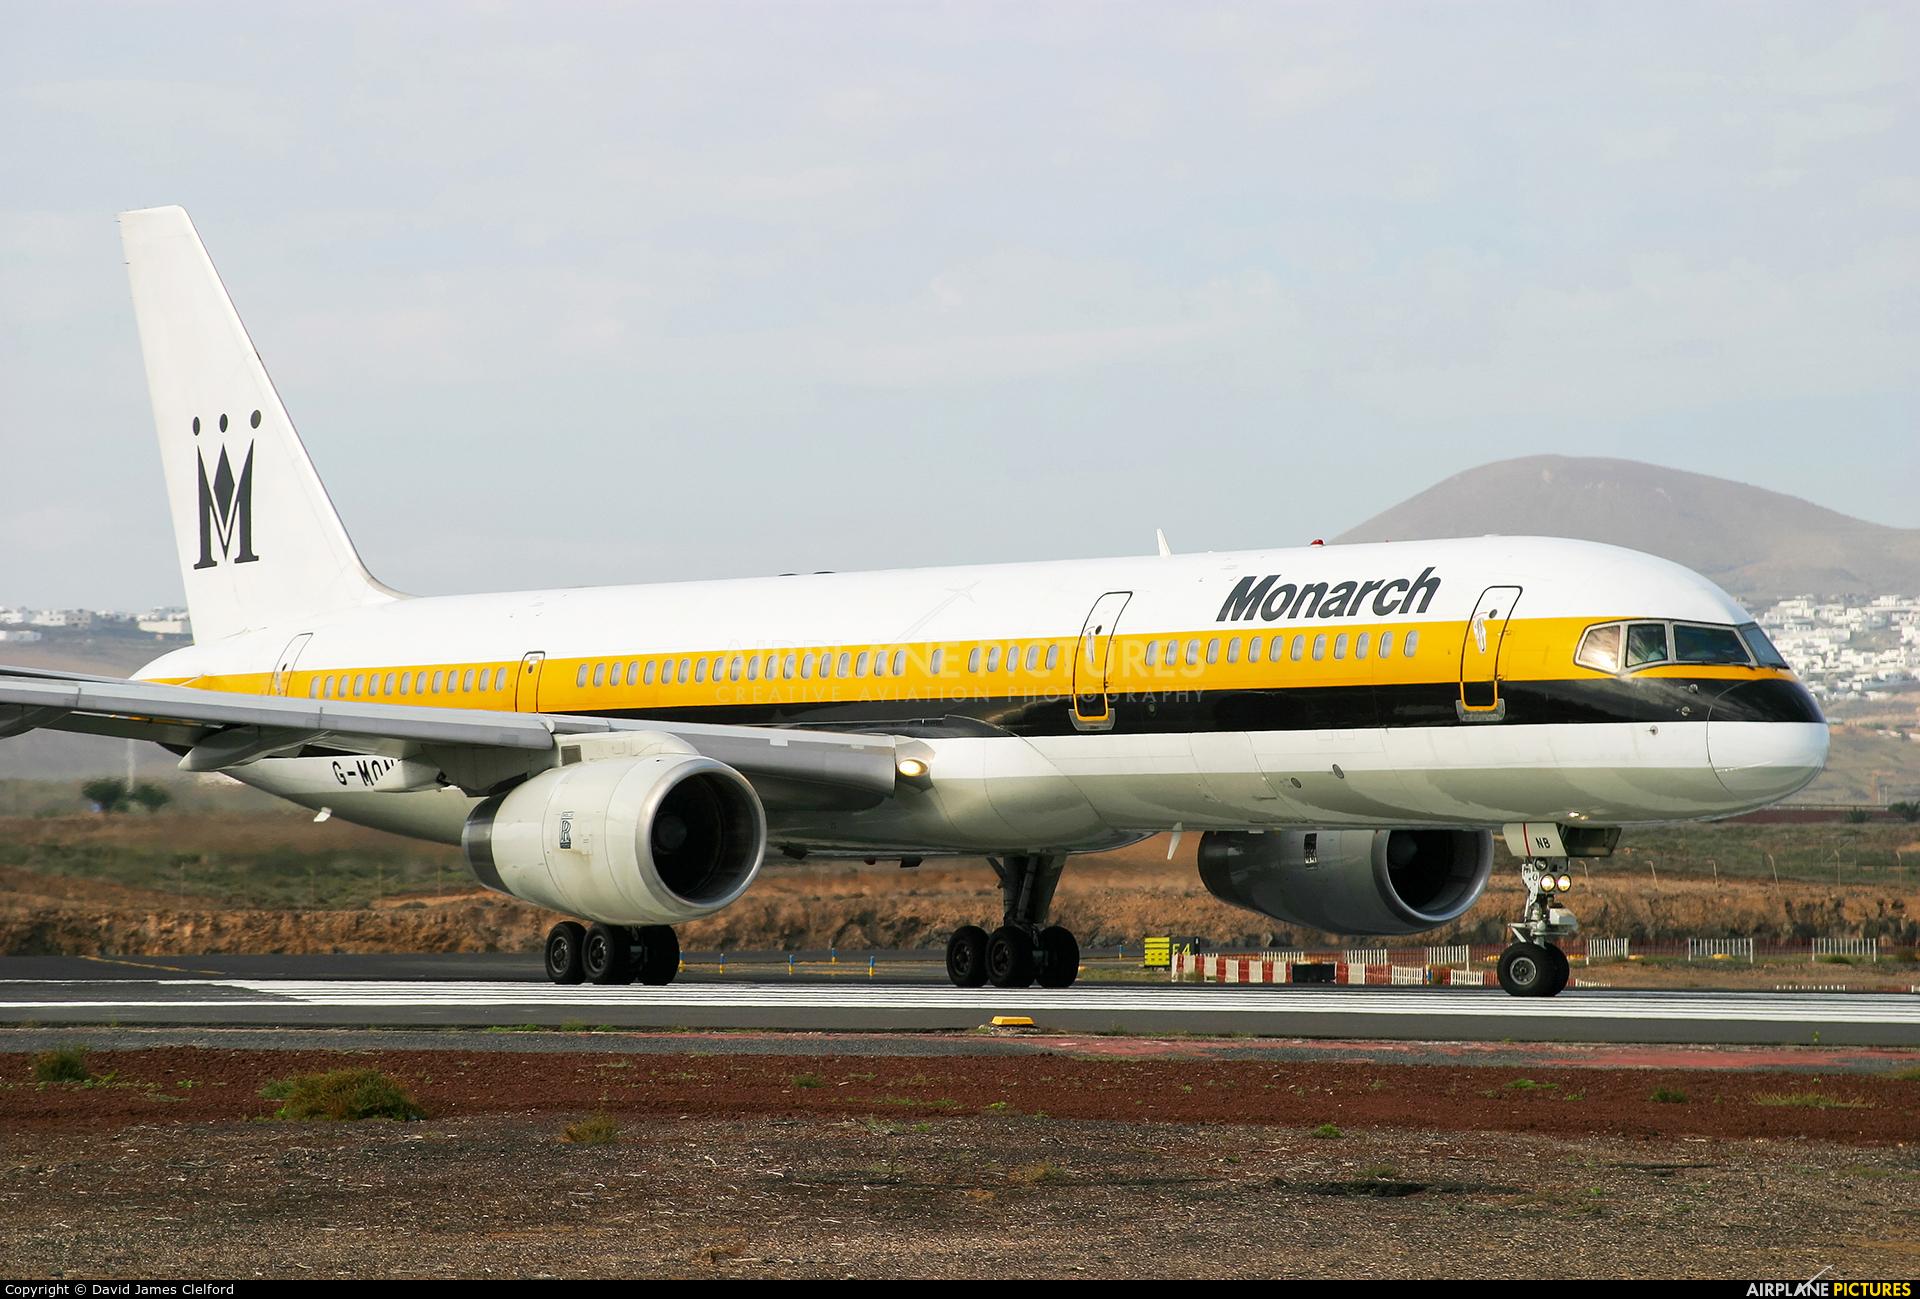 Monarch Airlines G-MONB aircraft at Lanzarote - Arrecife